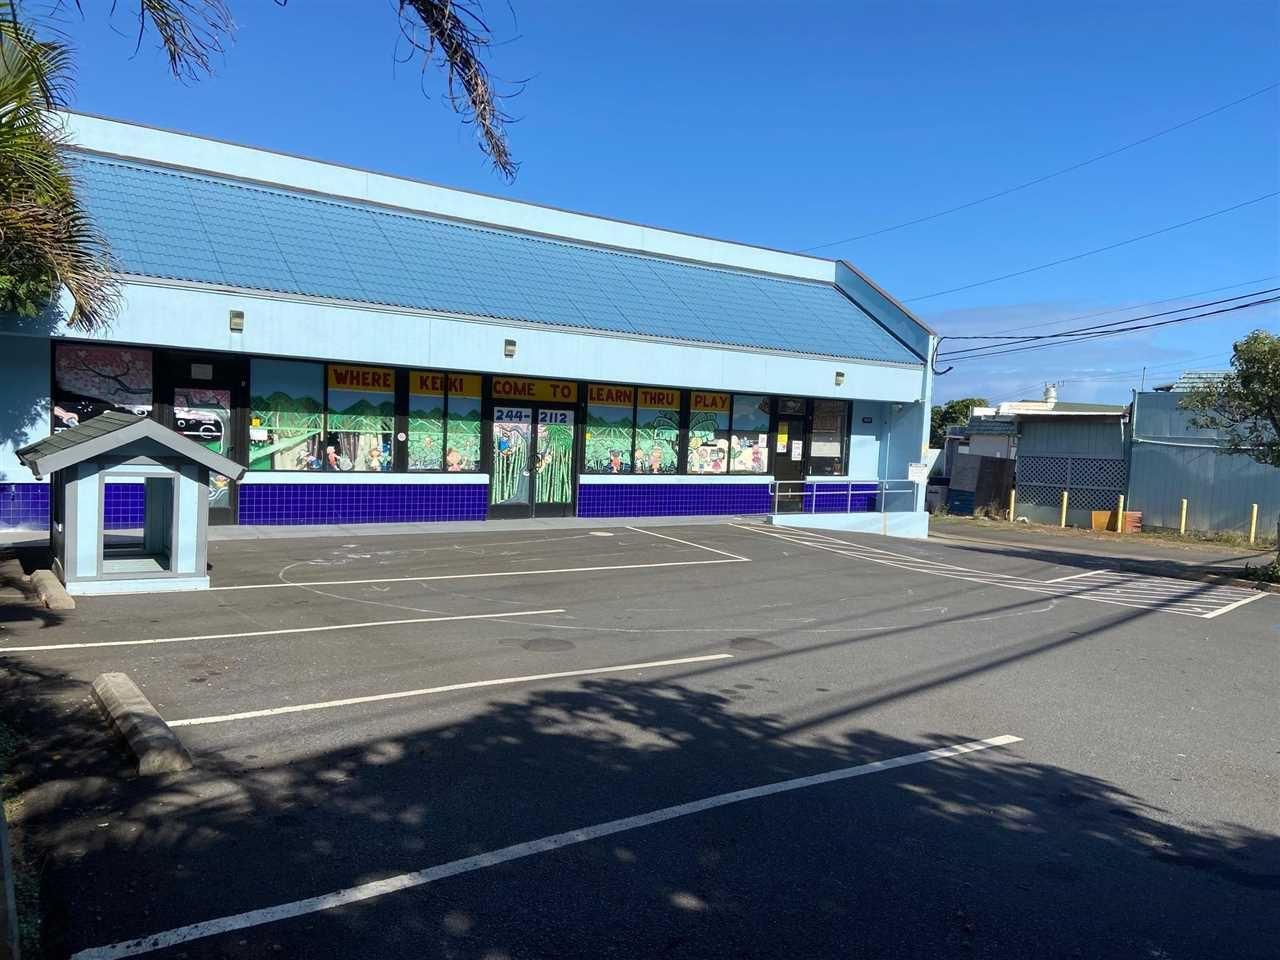 Photo of 1050 Lower Main St, Wailuku, HI 96793 (MLS # 392441)